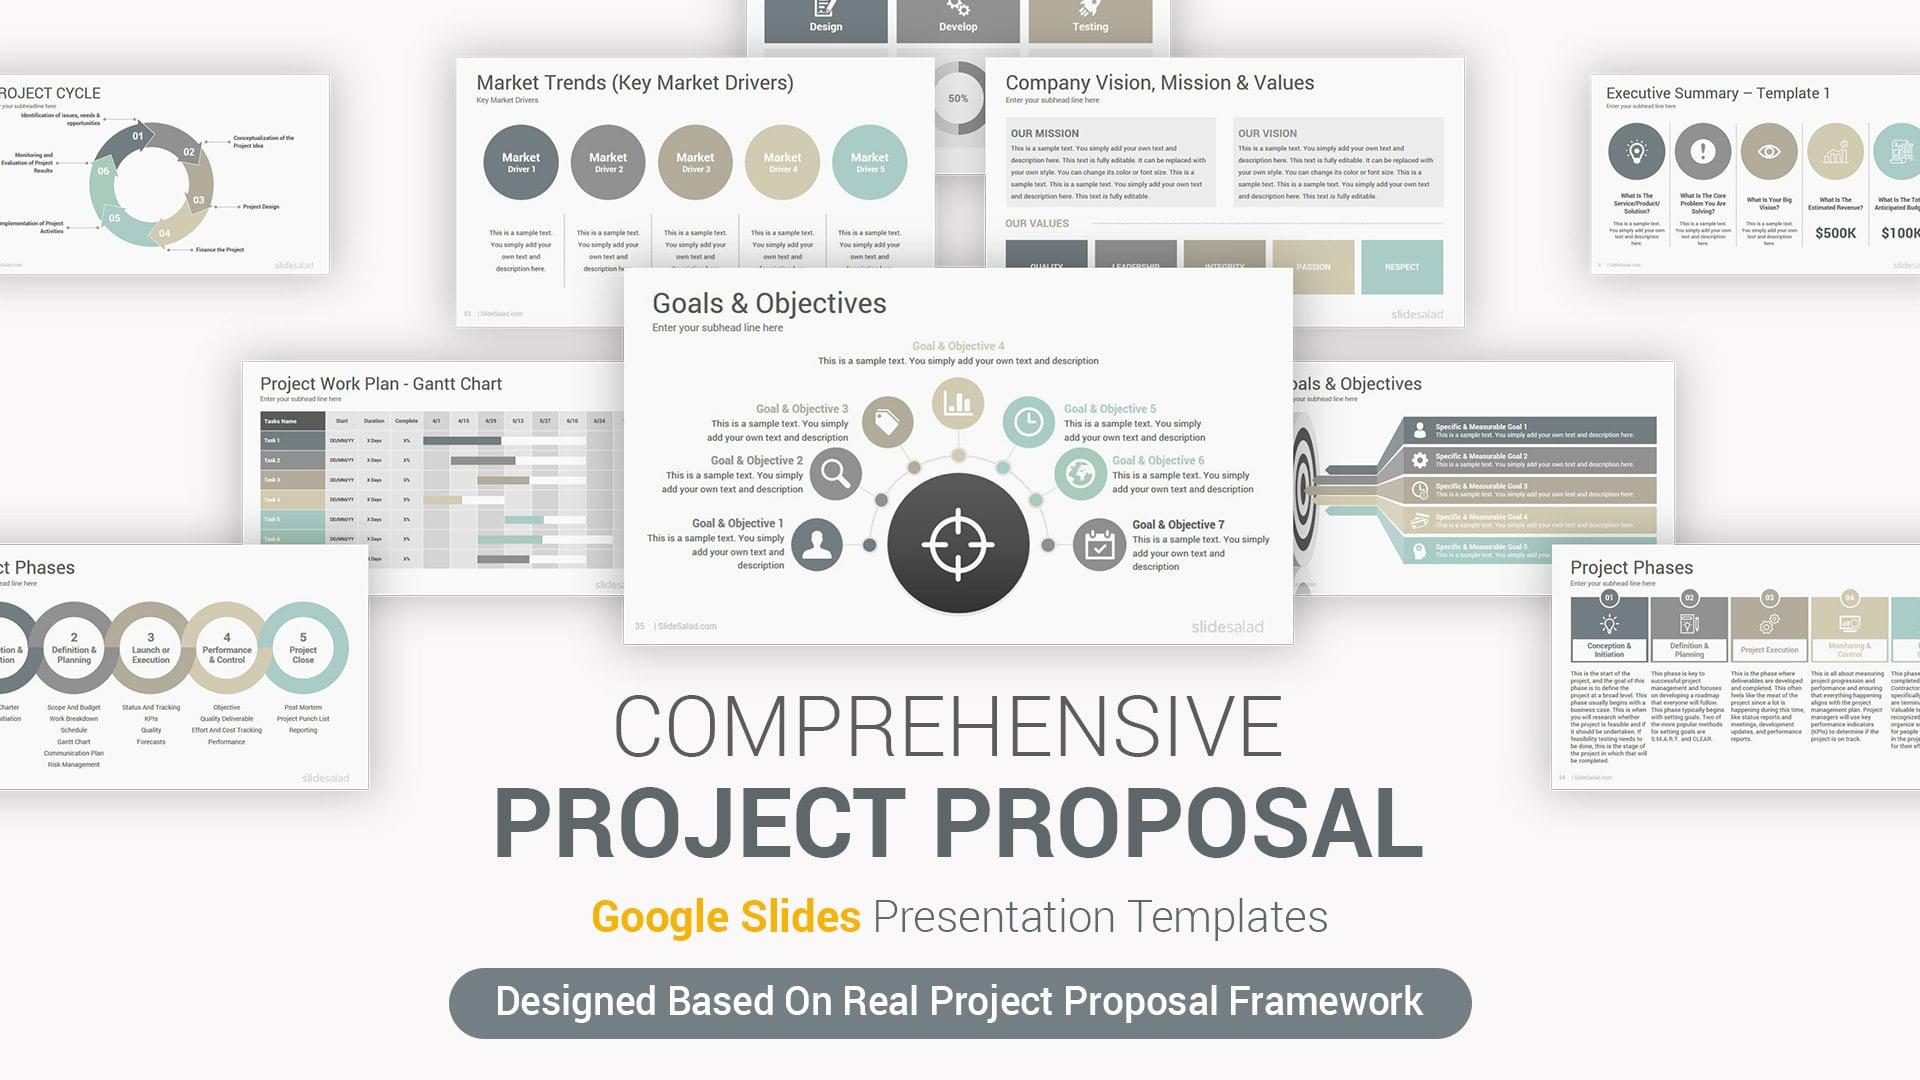 Best Project Proposal Google Slides Template - Creative Business Google Slides Template